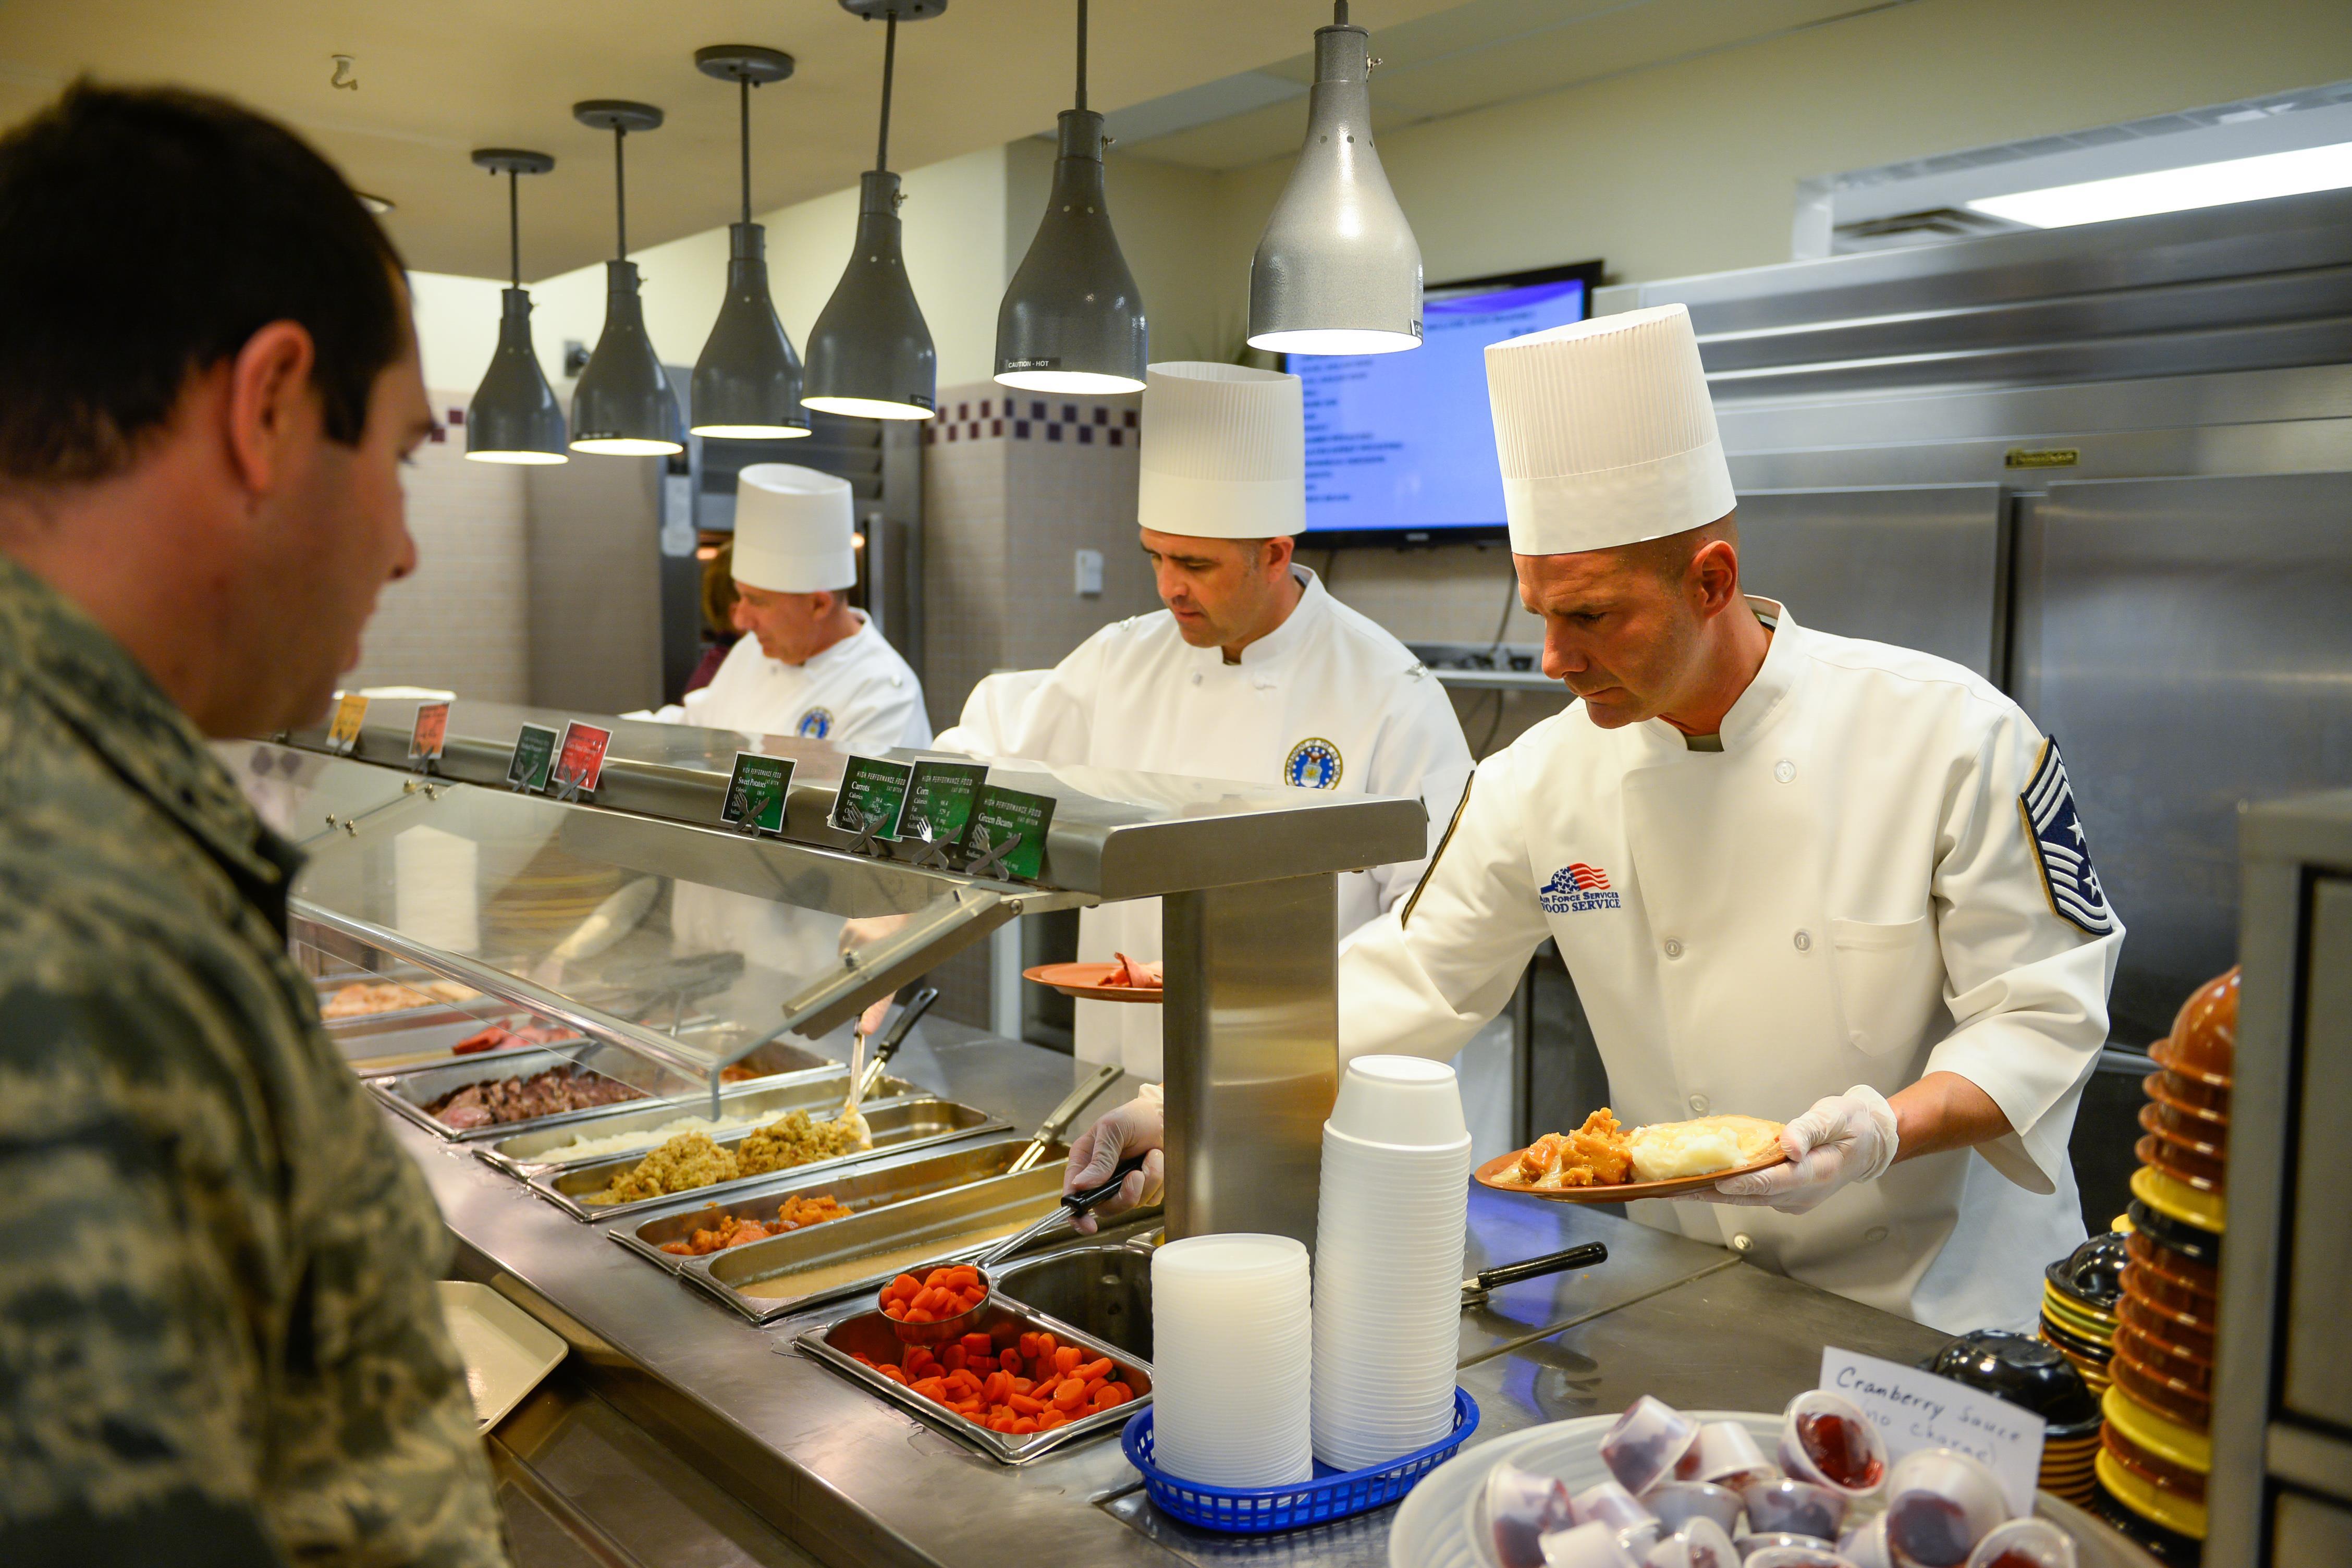 Senior leaders serve thanksgiving lunch schriever air for What to serve for thanksgiving lunch